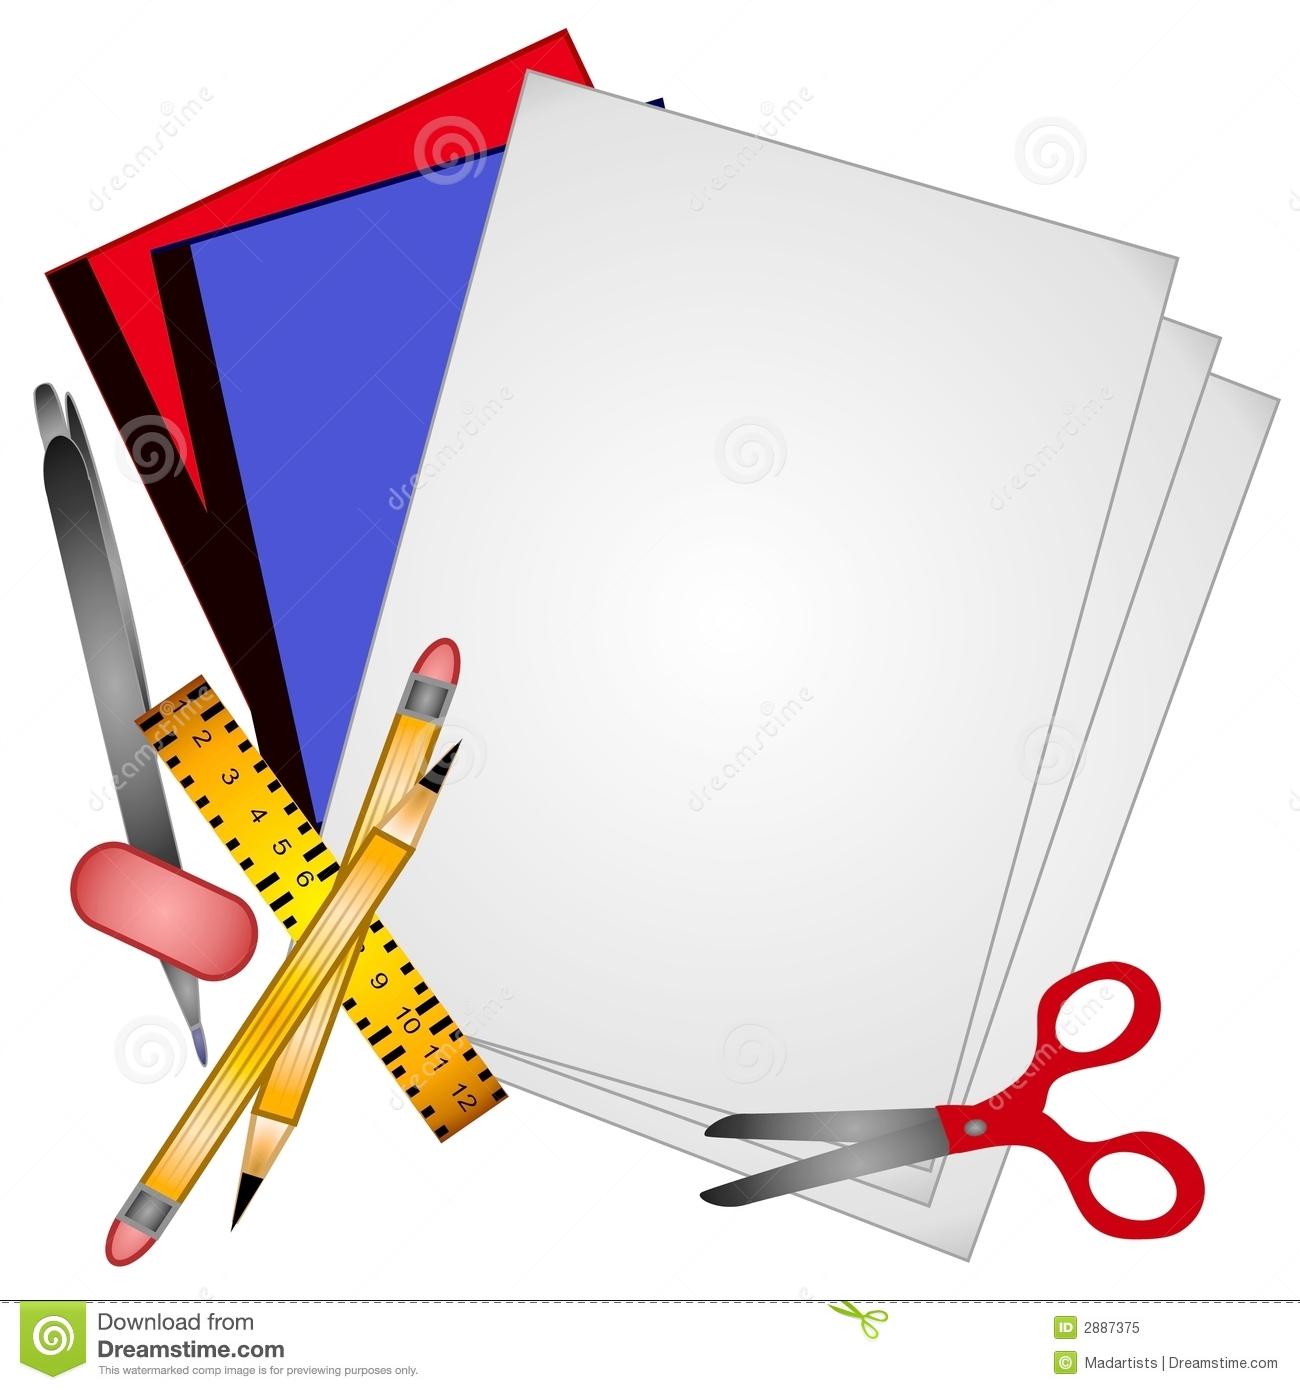 Pencil panda images . Free clipart paper and pencils